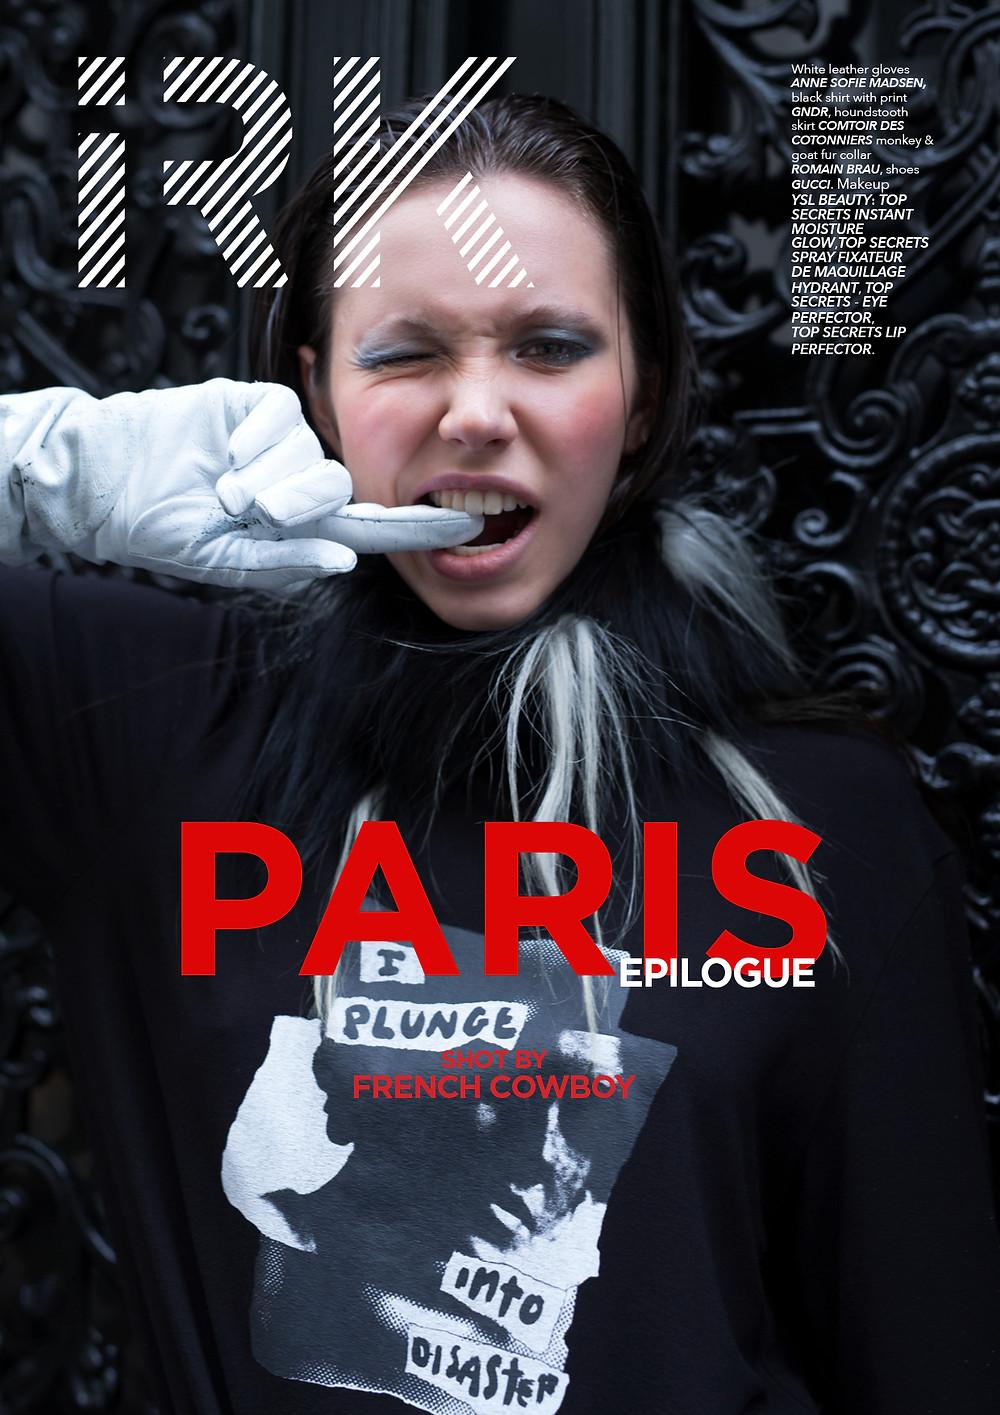 Mia Macfarlane  Editor- in Chief (of FRENCH COWBOY)